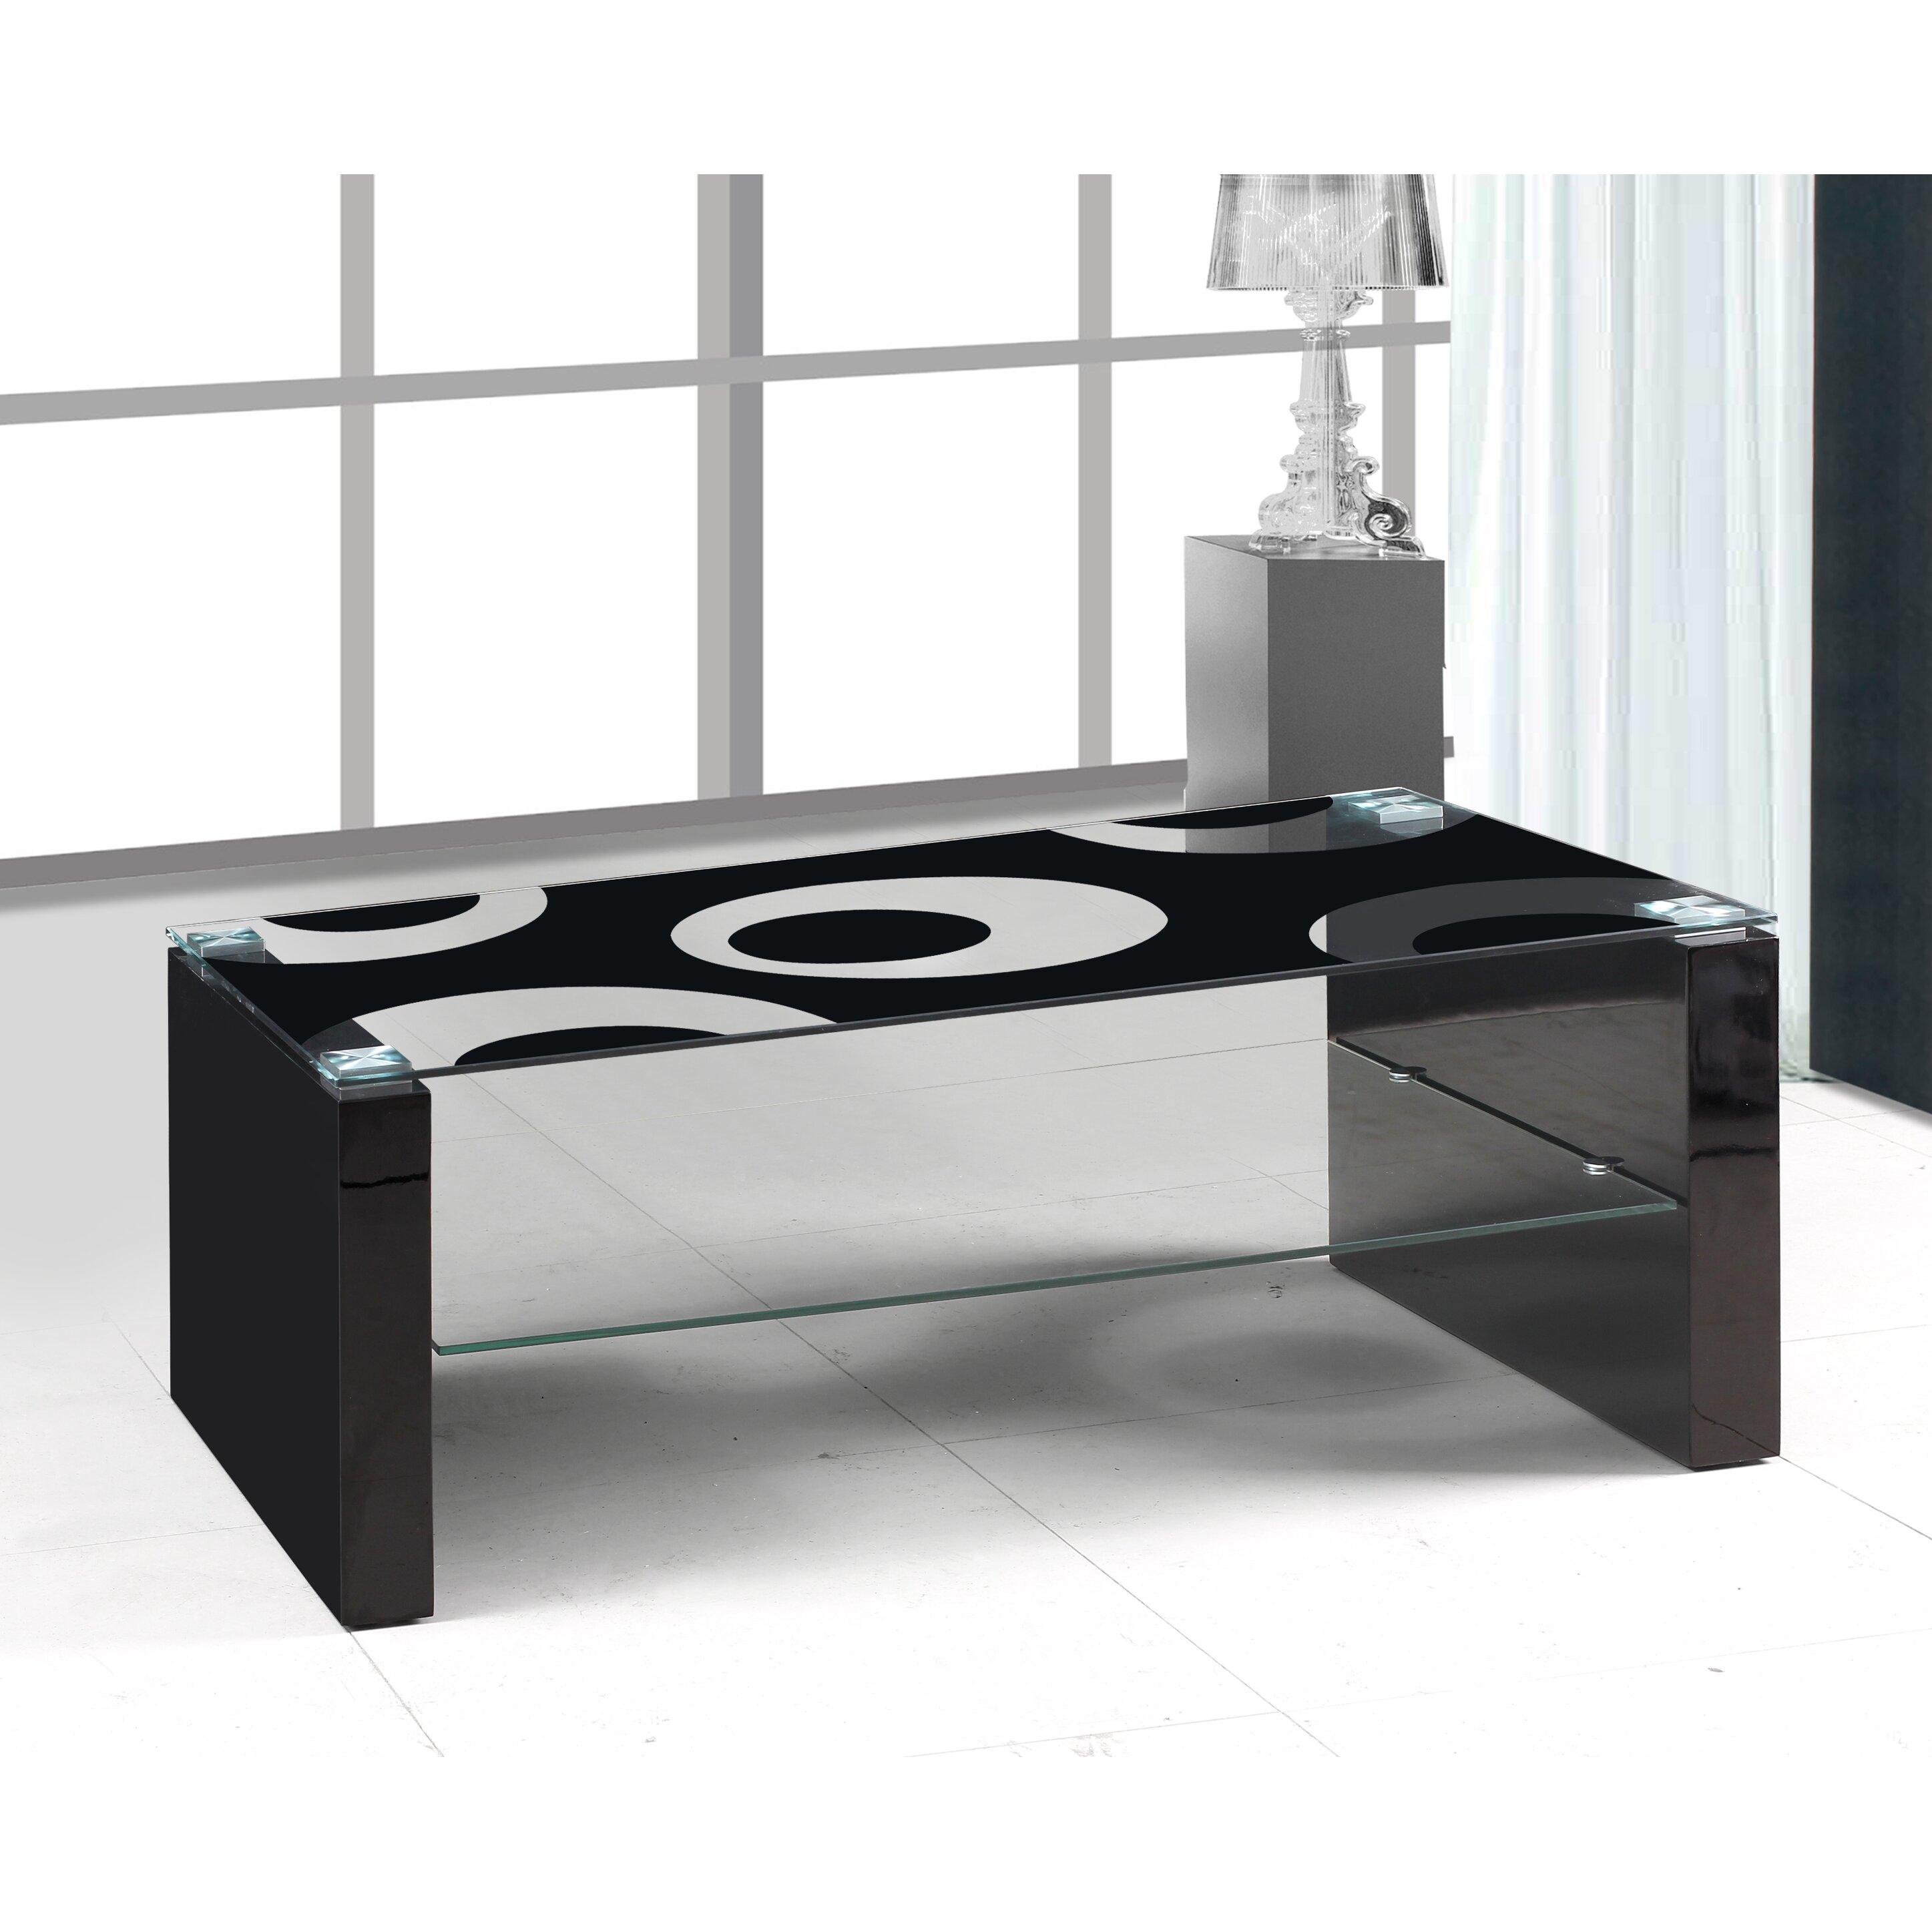 Wayfair Glass Coffee Table Uk: Urban Designs Coffee Table With Magazine Rack & Reviews